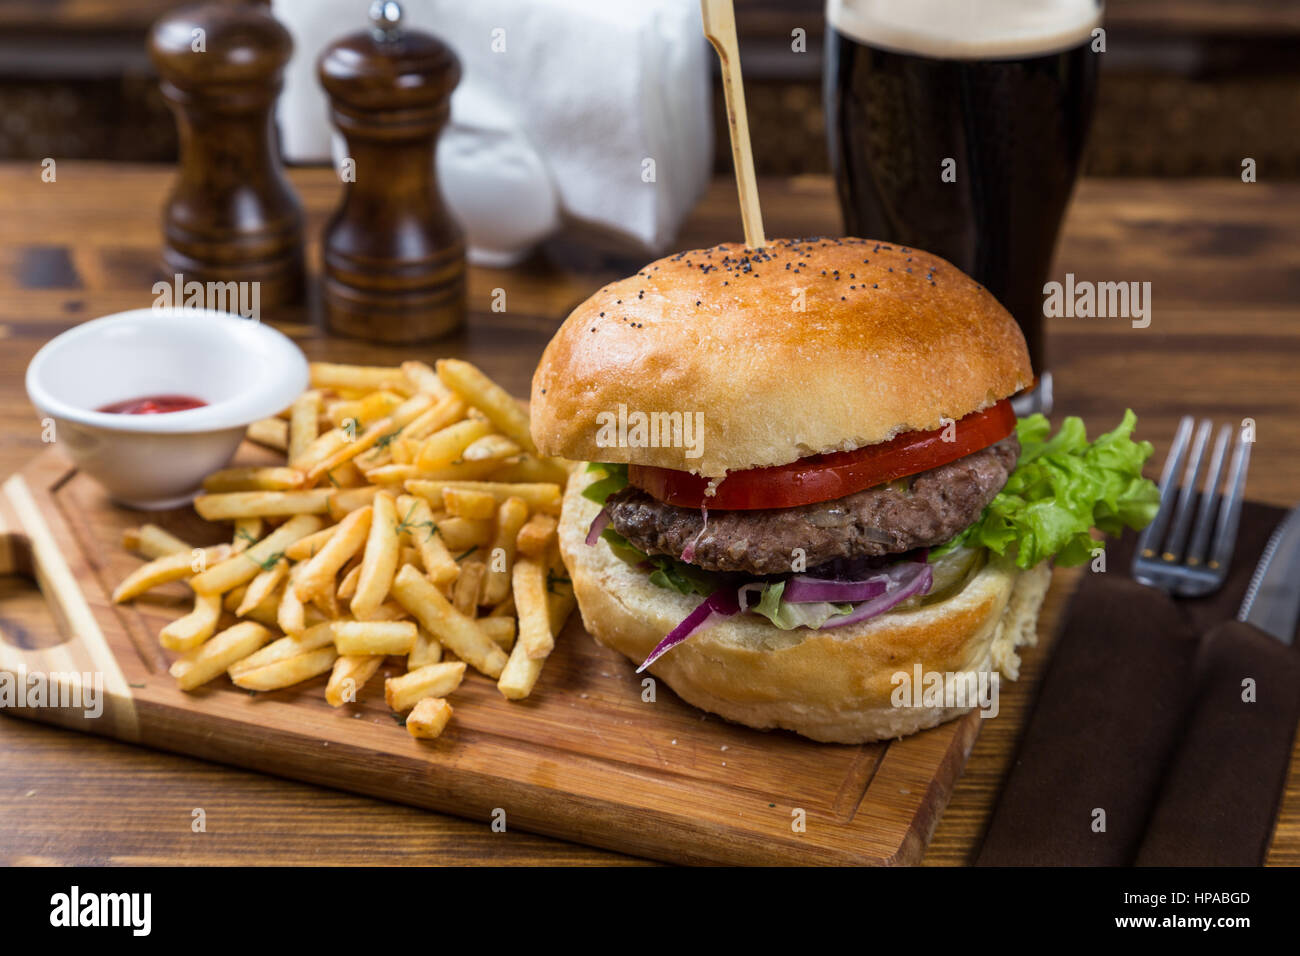 Huhn oder Pelz Burger